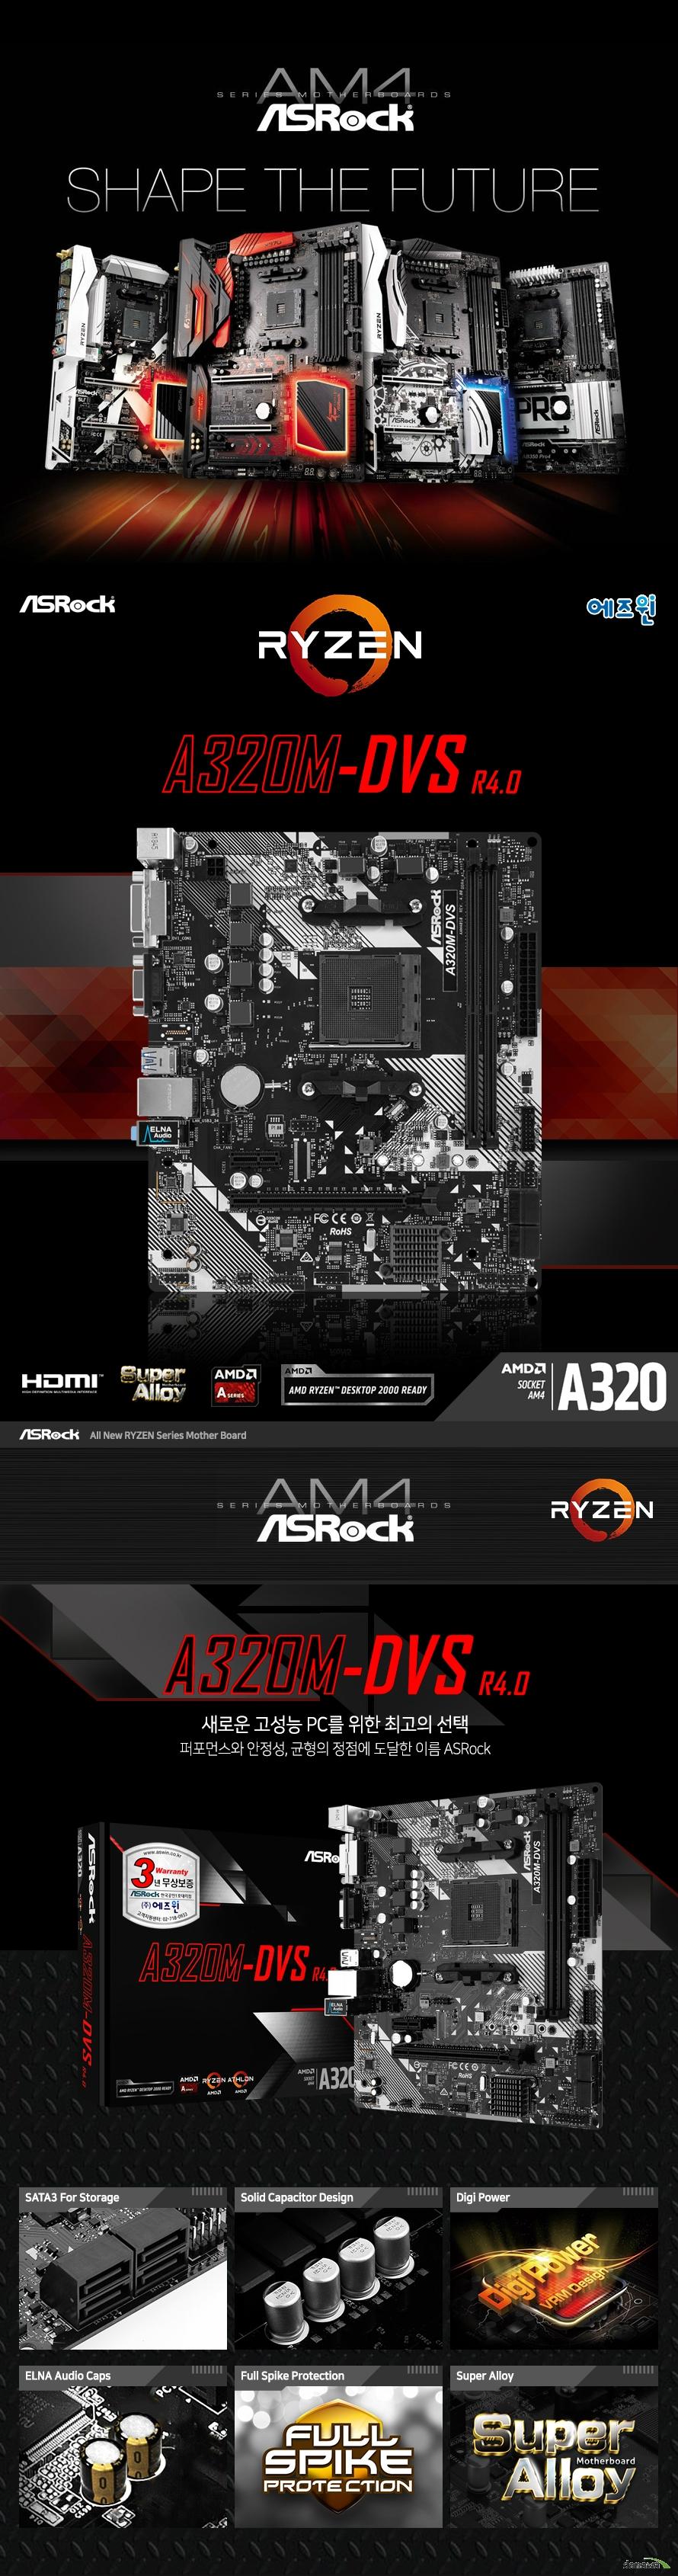 ASRock A320M-DVS R4.0 에즈윈  마이크로 ATX 폼팩터 규격 가로 20.1 센티미터 세로 23 센티미터  AMD AM4 소켓 지원 라이젠 CPU 및 A 시리즈 APU 지원  AMD A320칩셋 적용  듀얼 채널 DDR4 메모리 슬롯 2개 총 32GB 지원 AMD 라이젠 피나클 릿지 CPU에서 3200 2933 2667 2400 2133 ECC 및 NON ECC 메모리 지원  AMD 라이젠 서밋 릿지 CPU에서 3200 2933 2667 2400 2133 ECC 및 NON ECC 메모리 지원  AMD 라이젠 레이븐 릿지 CPU에서 3200 2933 2667 2400 2133 NON ECC 메모리 지원  AMD 7세대 A 시리즈 APU에서 2400 2133 non ecc 메모리 지원   확장슬롯지원  Amd 라이젠 서밋 릿지 및 피나클 릿지 cpu에서  Pcie 3.0 16배속 슬롯 1개 지원  Amd 라이젠 레이븐 릿지 cpu에서 Pcie 3.0 16배속 슬롯 1개 지원 및 8배속으로 동작 만약 애슬론 2xxge 시리즈 apu를 사용하면 pcie2 슬롯은 4배속으로 작동합니다.  Amd 7세대 시리즈 apu에서 Pcie 3.0 16배속 슬롯 1개 지원 및 8배속으로 동작  Pcie 2.0 1배속 슬롯 지원  리얼텍 alc887 오디오 코덱 지원  리얼텍 rtl8111gr 기가비트 랜 지원  Sata3 포트 4개 지원 2242 2260 2280 규격 울트라 m.2 소켓 1개 지원  Amd 라이젠 cpu에서 m.2 sata3 및 pcie gen3 4배속 지원  amd a 시리즈 apu 및 애슬론 2xxge 시리즈 apu에서 m.2 sata3 및 pcie gen3 2배속 지원 nvme ssd 부트 디스크 및 asrock u.2 키트 지원  usb 3.1 gen 1 포트 6개 지원 usb 2.0 포트 6개 지원  uefi 바이오스 지원  kc 인증번호 r r asr a320mhdvr3  제조사의 사정에 따라 사전고지 없이 일부 제품사양이 변경될 수 있습니다. 구매 전 파워 서플라이의 cpu 프로세서 지원 여부를 확인하시기 바랍니다.